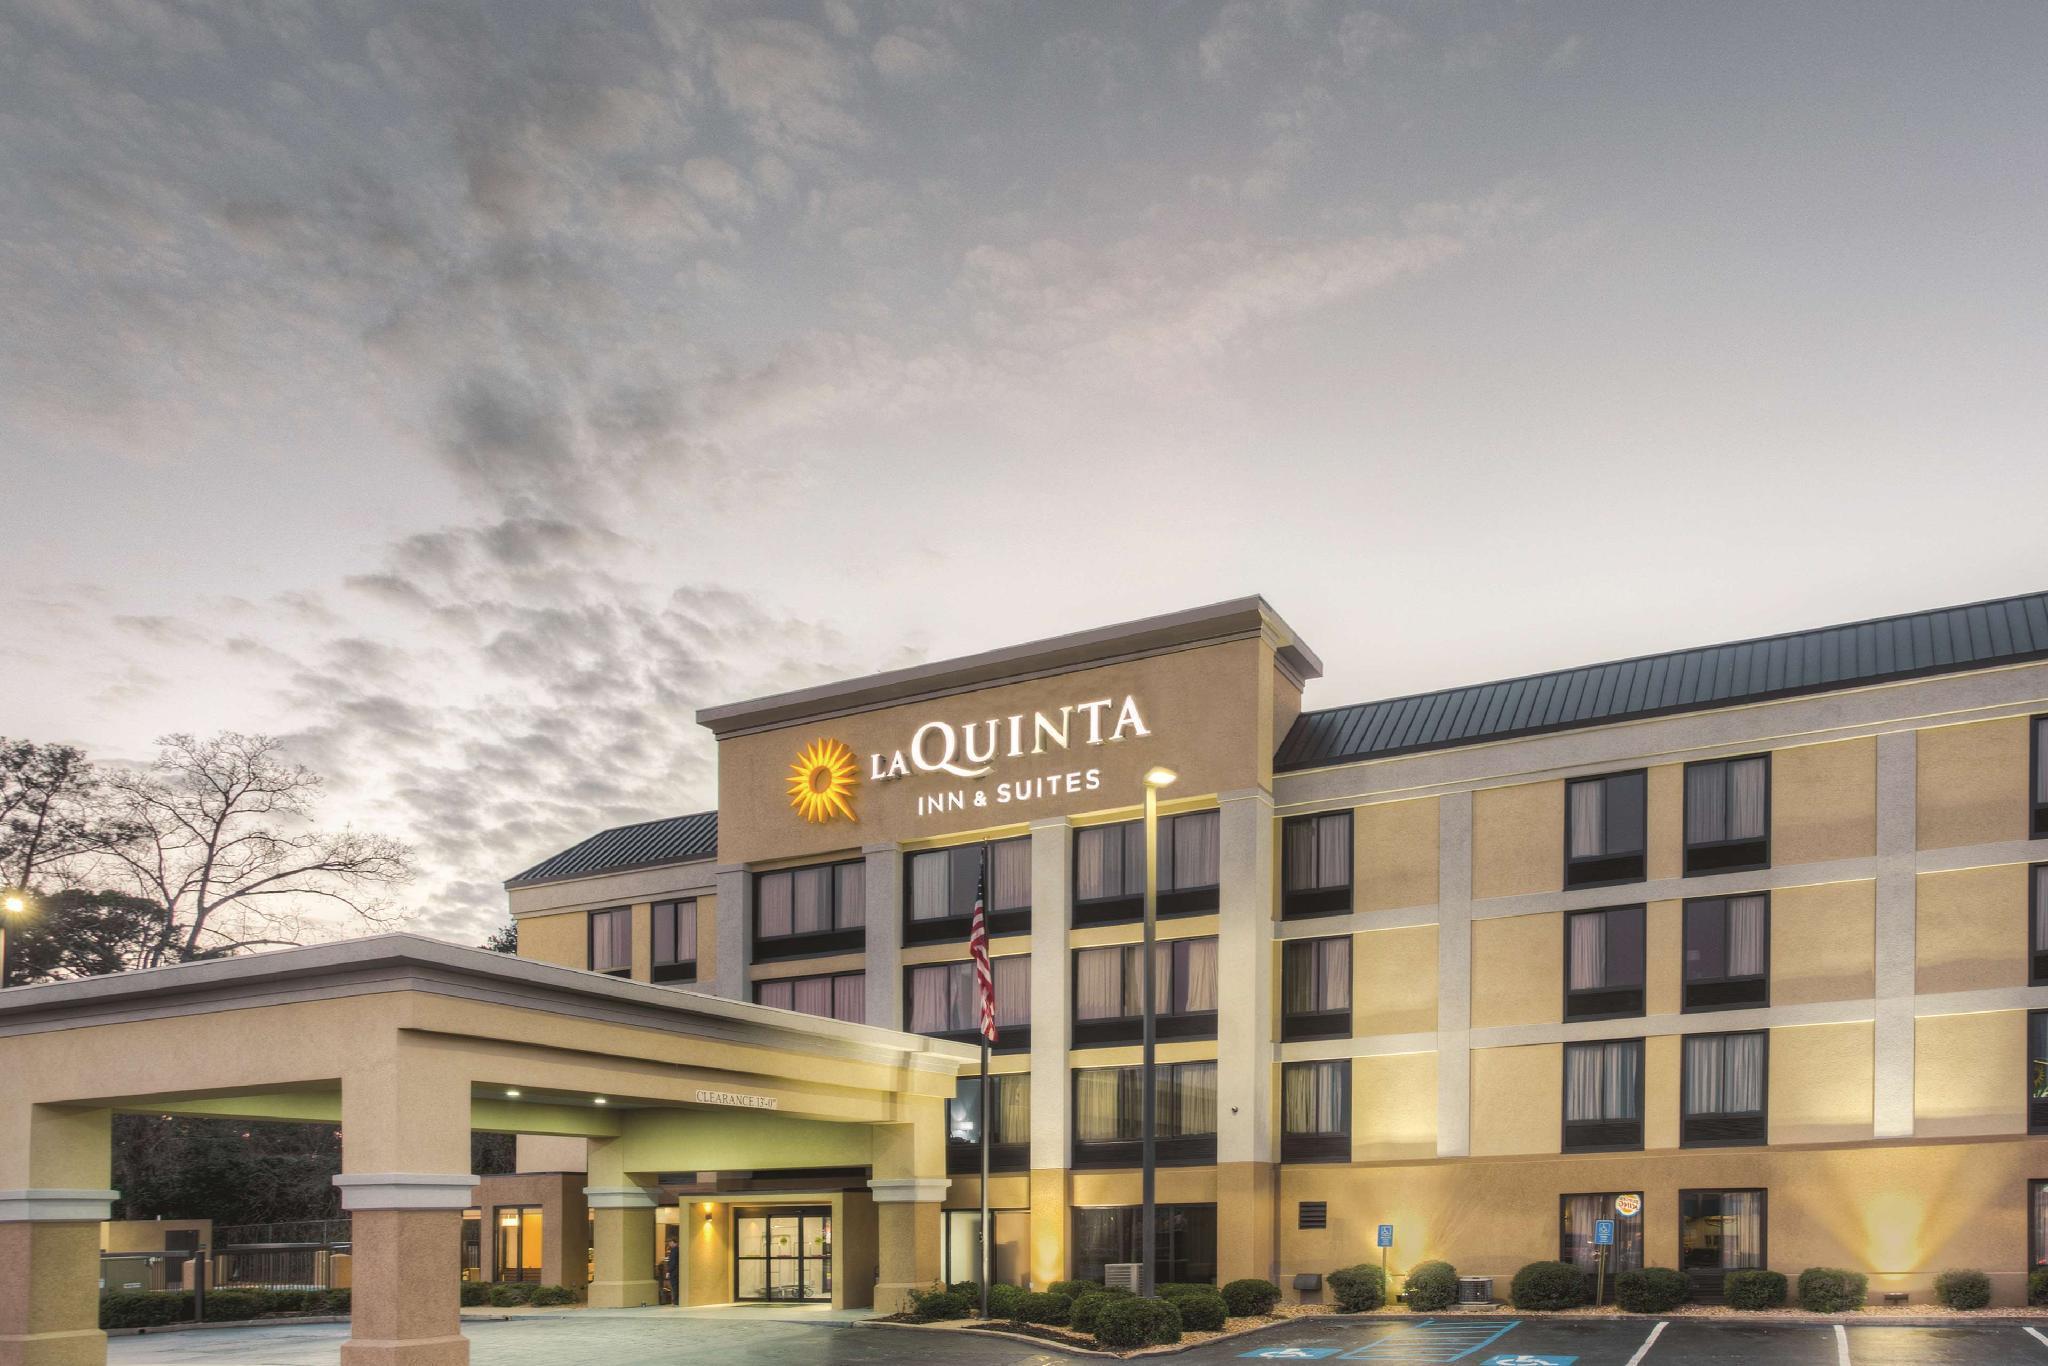 La Quinta Inn And Suites By Wyndham Jackson North